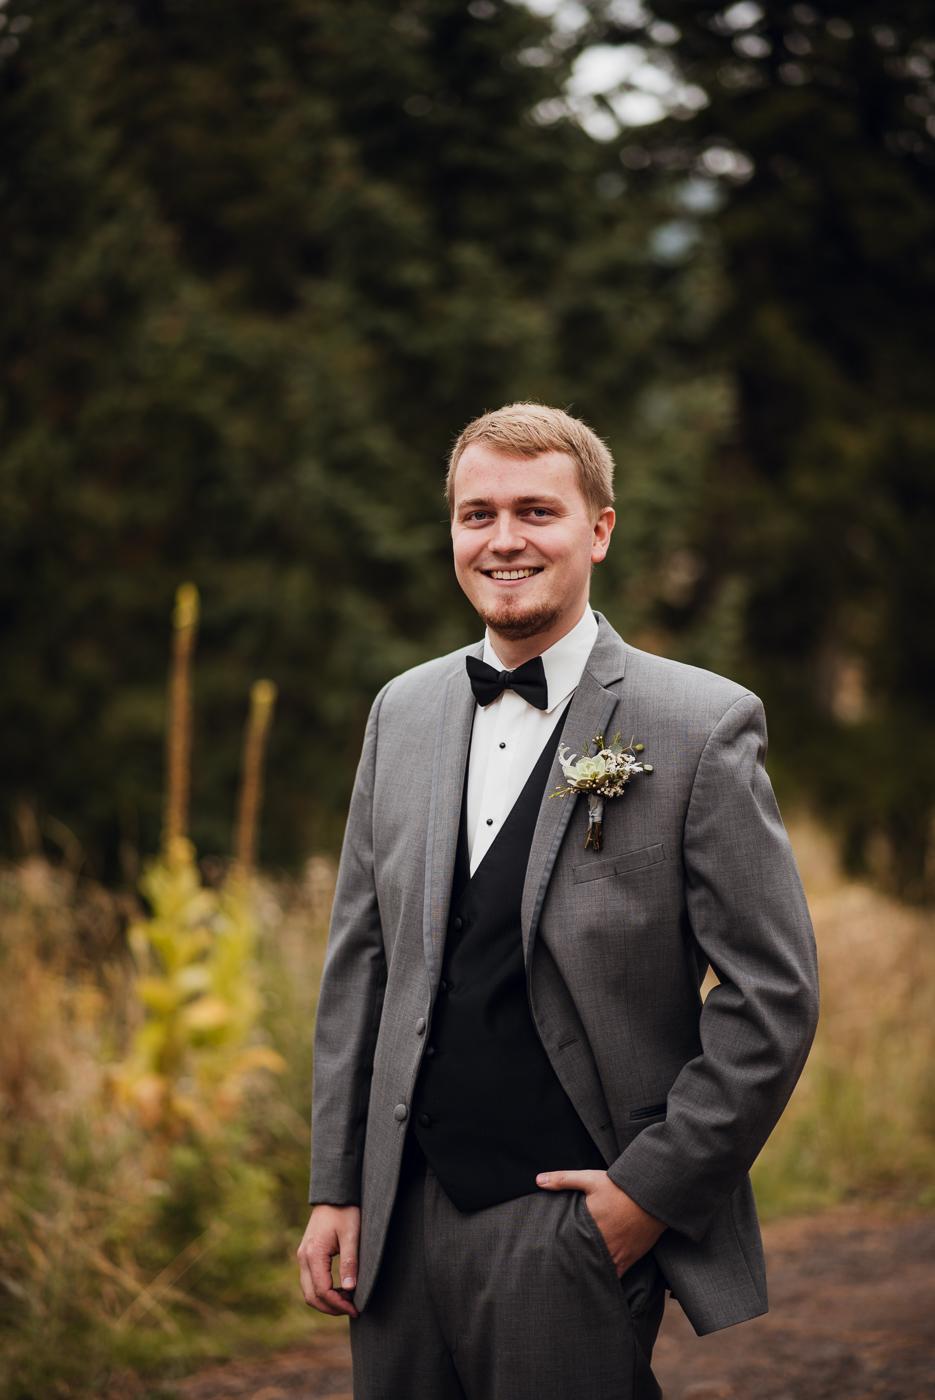 Candice Rawlin Wedding PHOCO Photography Pines Genesee Golden Colorado Fog -10.jpg